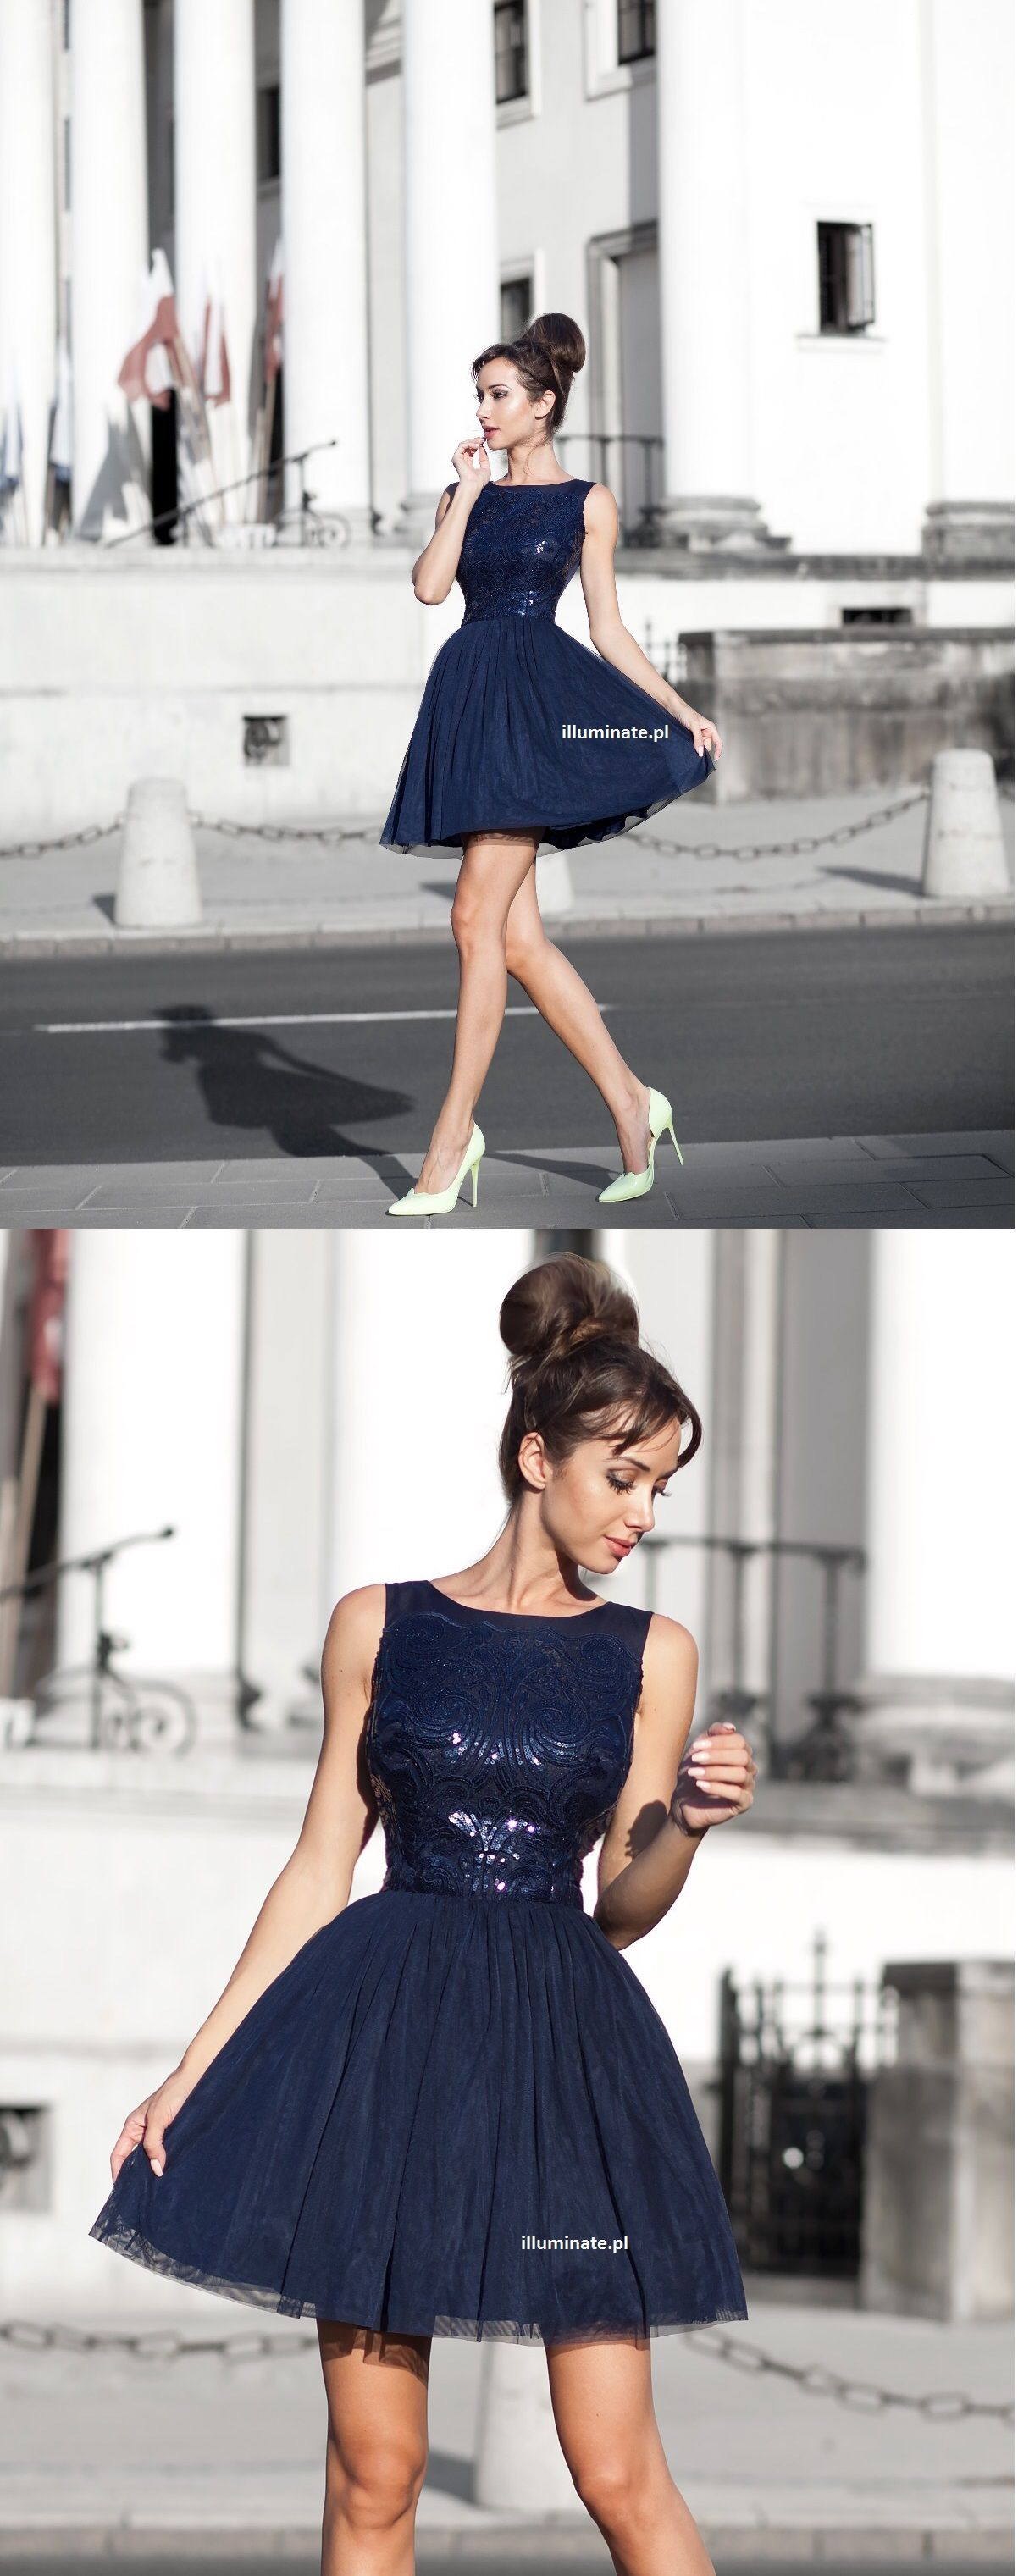 Tiulowa Granatowa Sukienka Elegancka Sukienka Na Wesele Illuminate Pl 349zl Dresses Evening Dresses Fashion